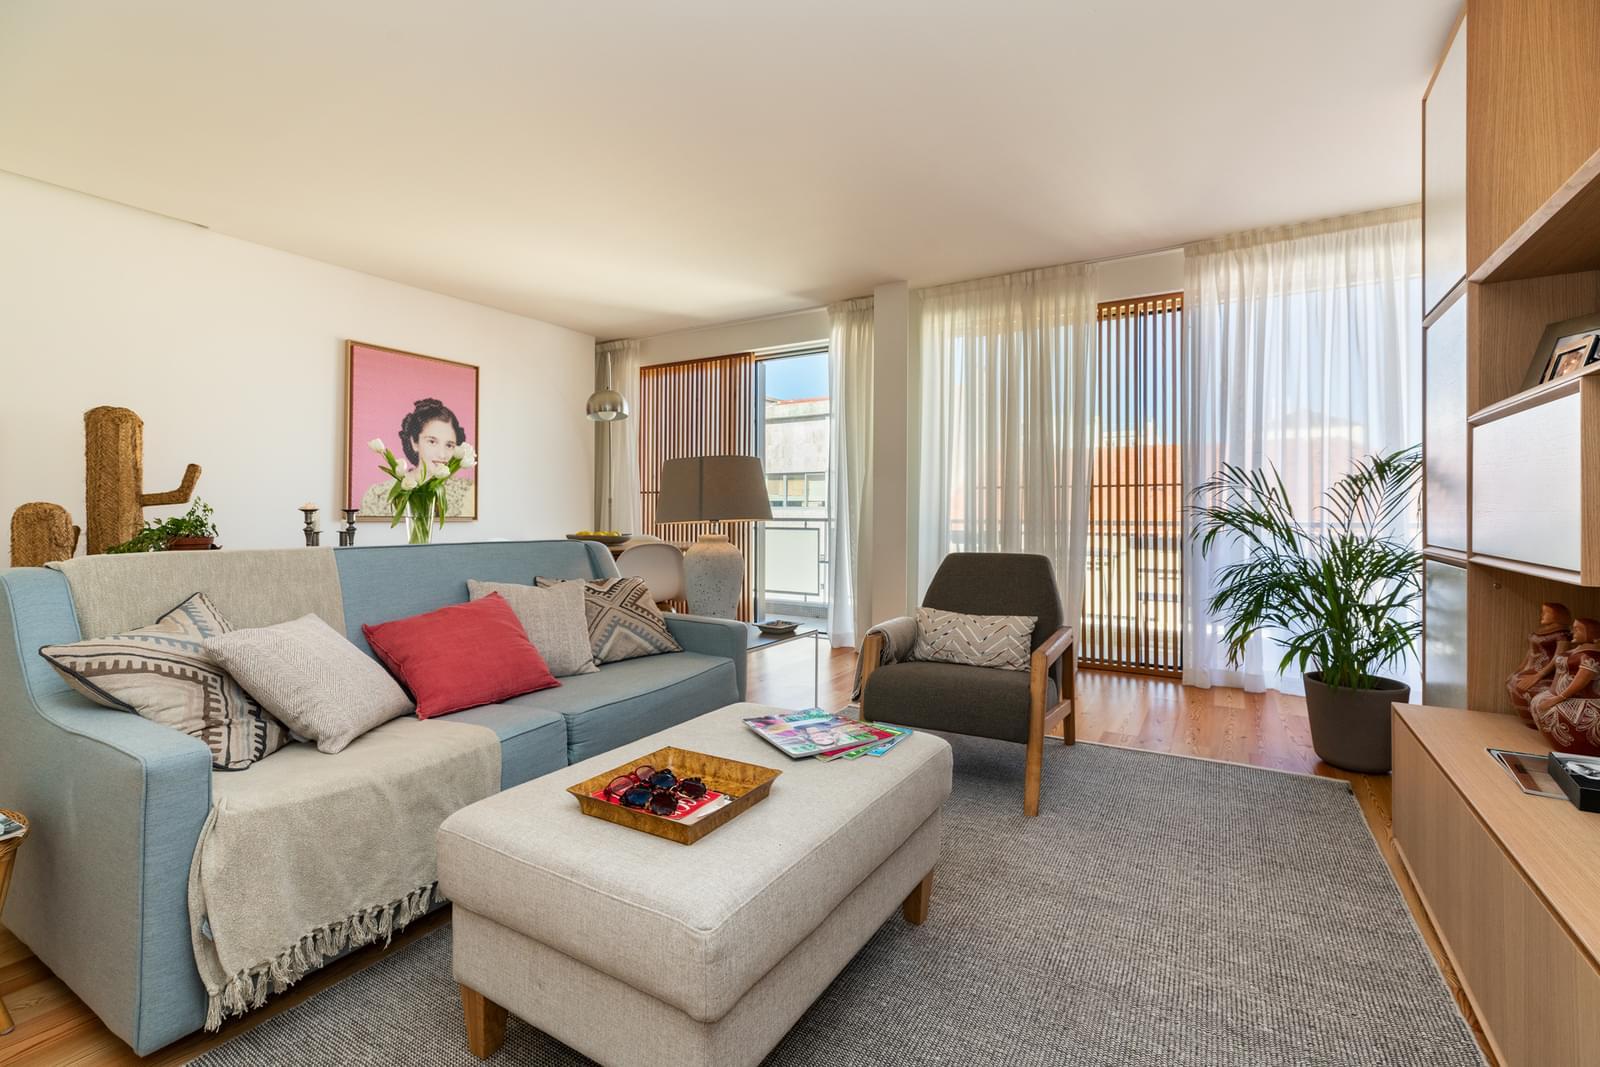 pf19126-apartamento-t2-lisboa-014e6265-8a08-4c70-a783-fcd3c9c15649